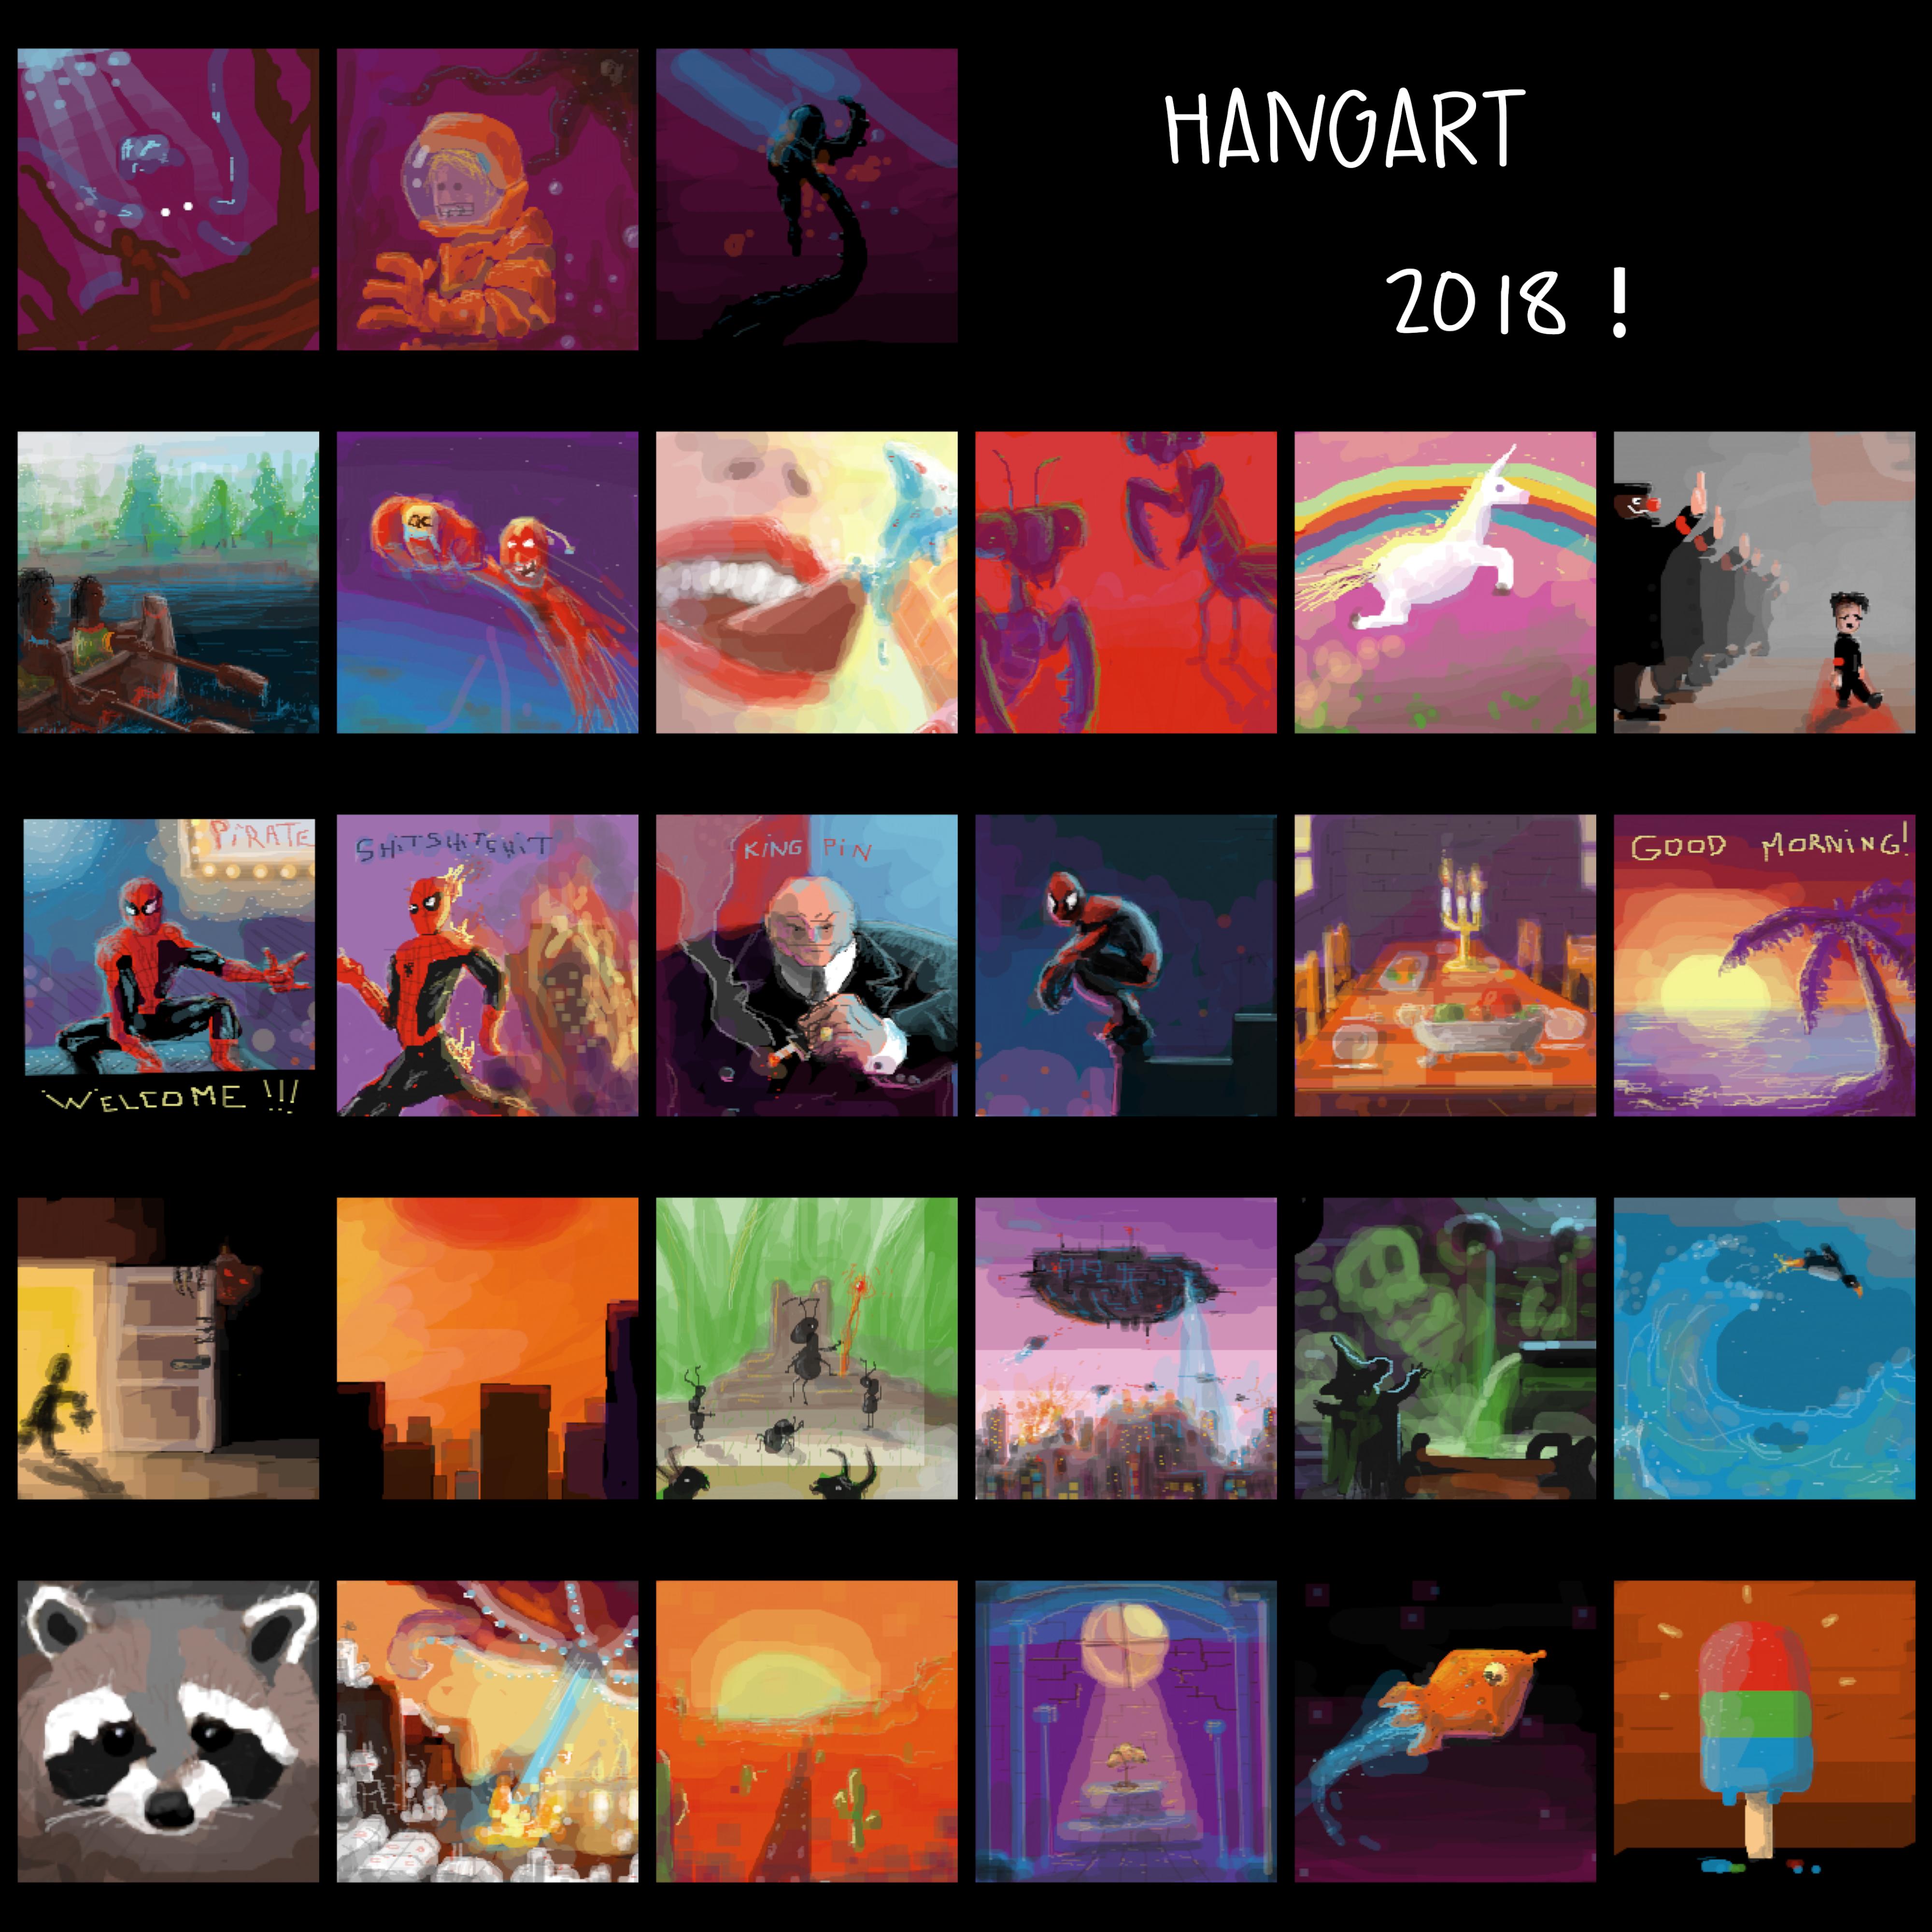 Hang'art 2018